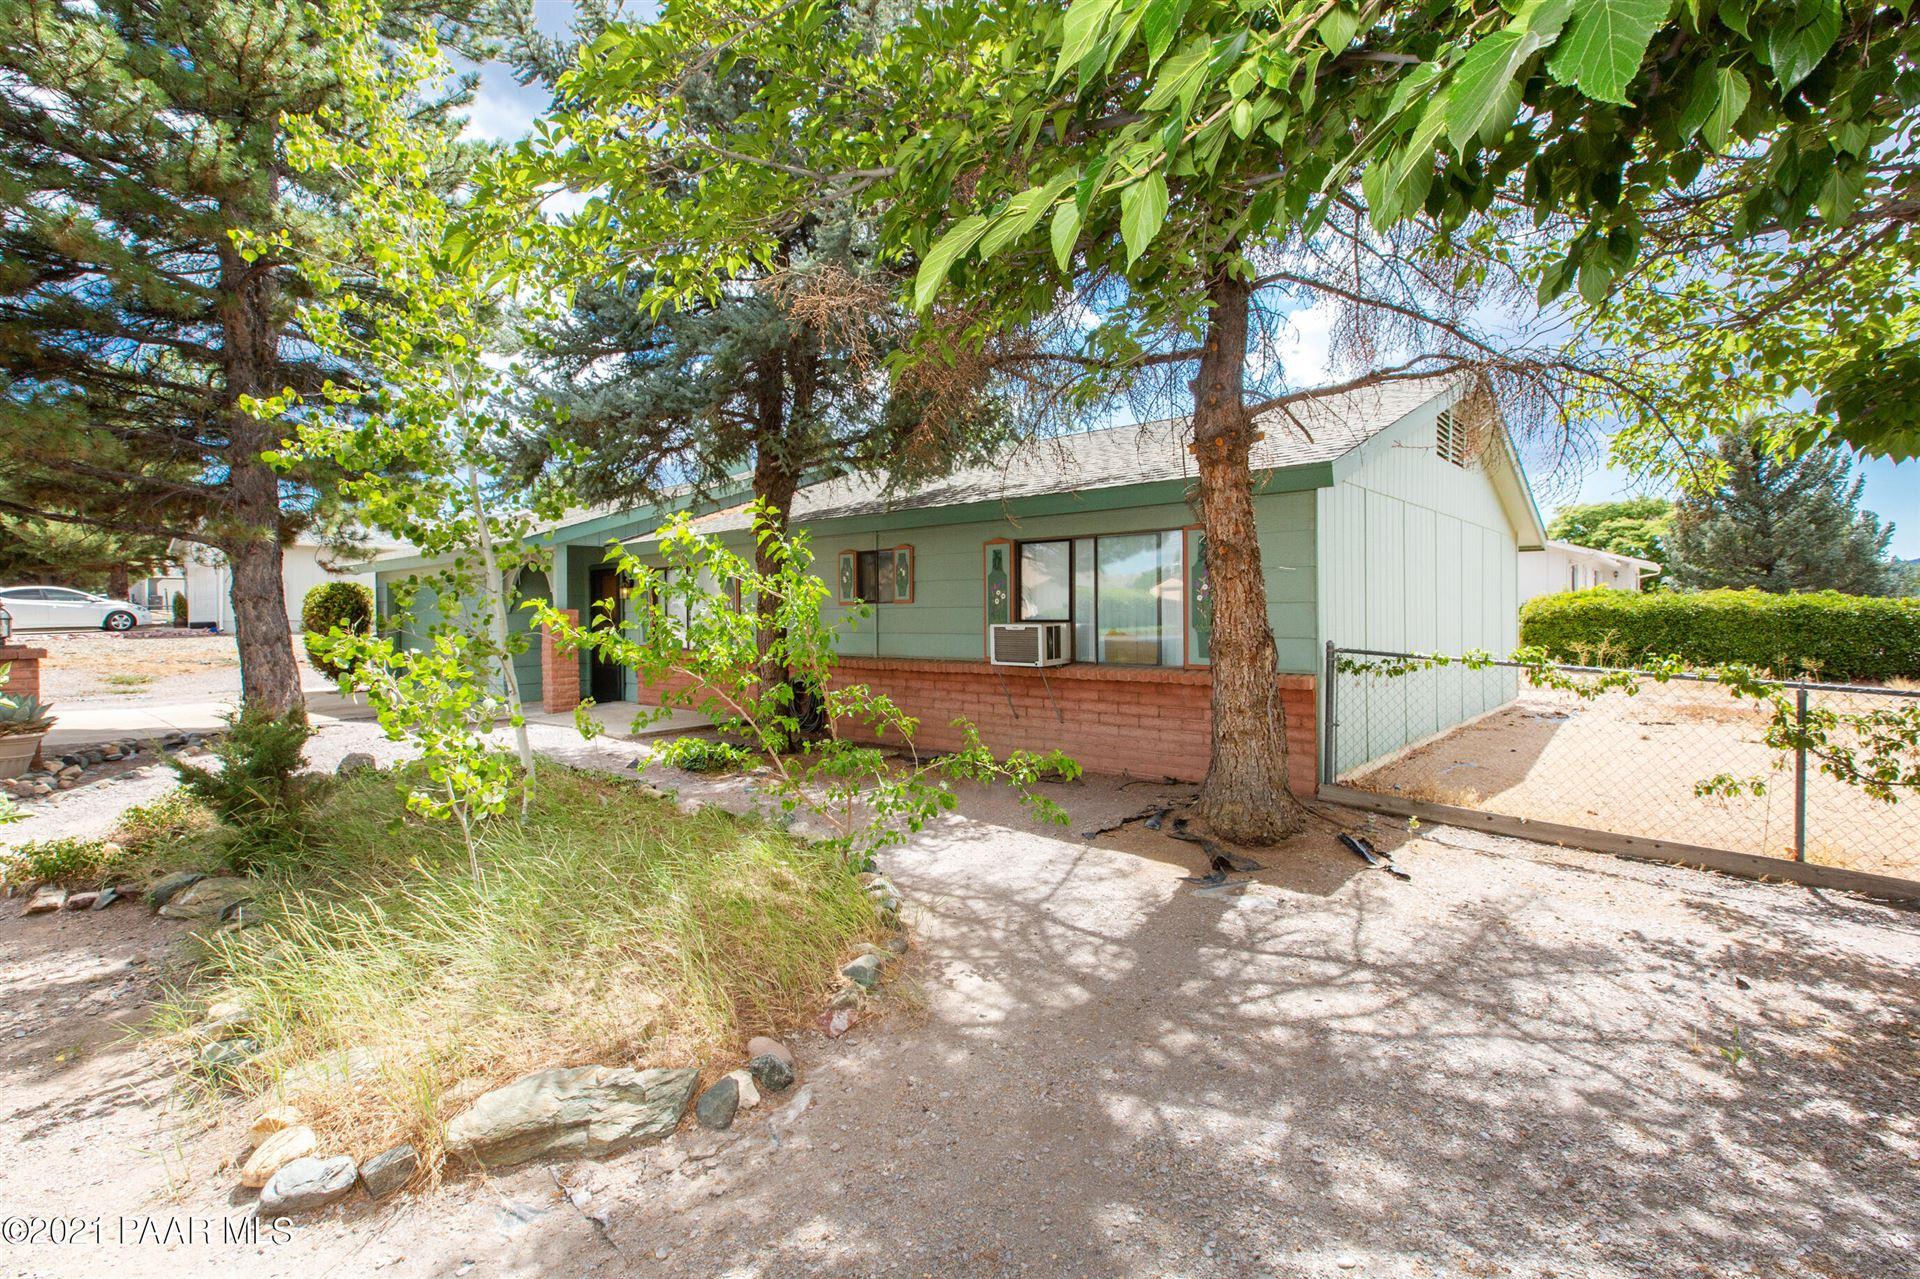 Photo of 4960 N Tonto Way #Lot: 7984, Prescott Valley, AZ 86314 (MLS # 1040432)